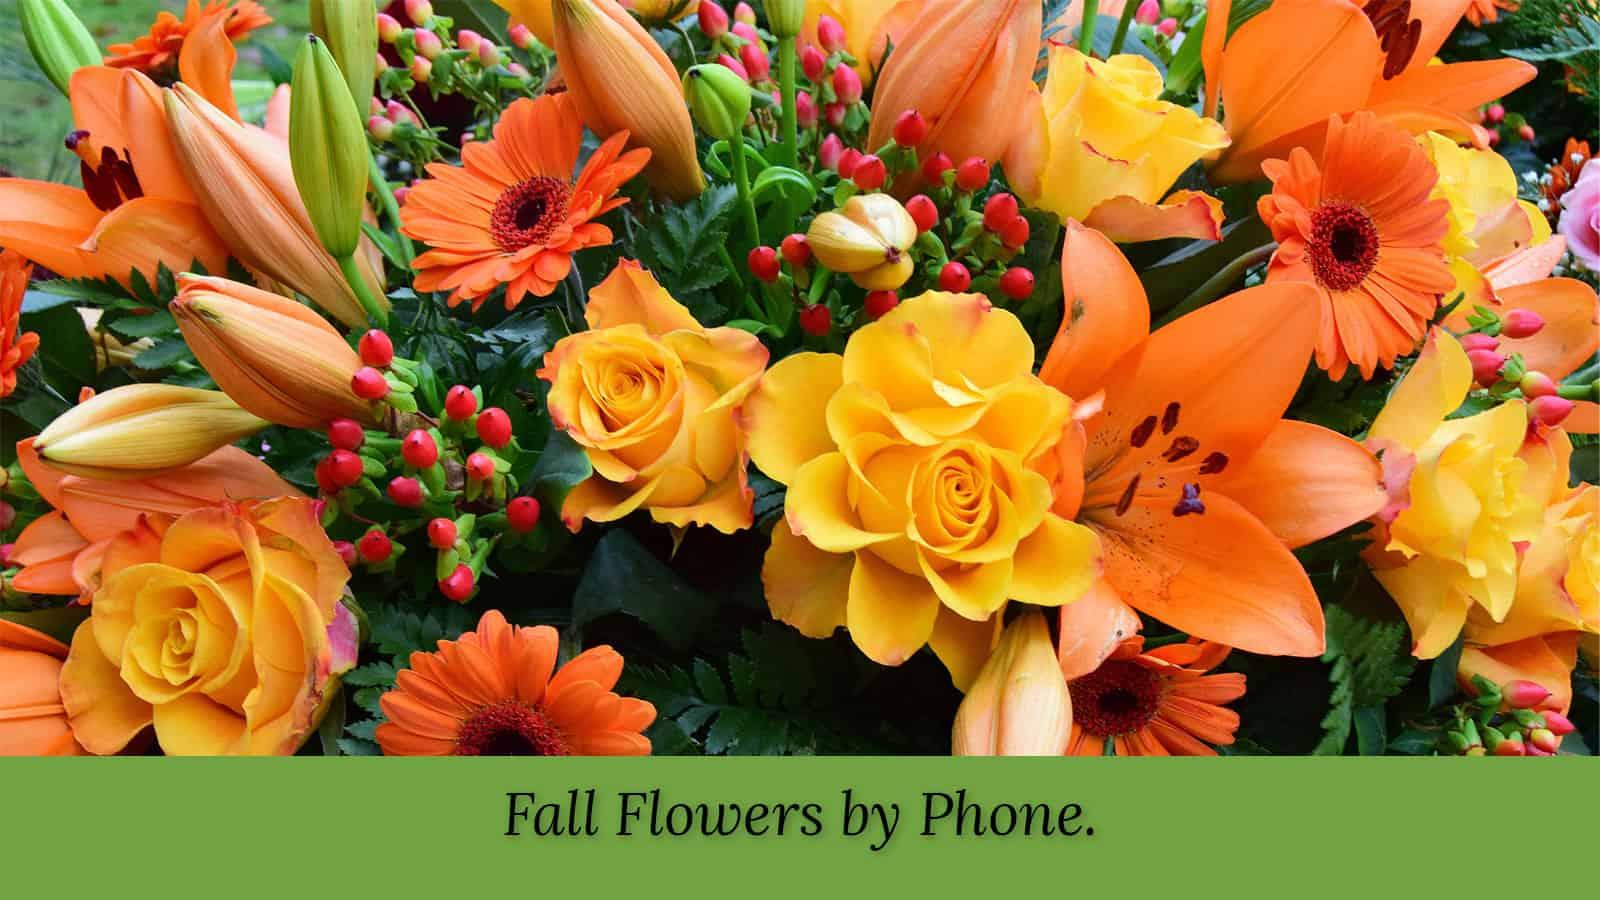 wmp-carousel-flowers-fall-lora